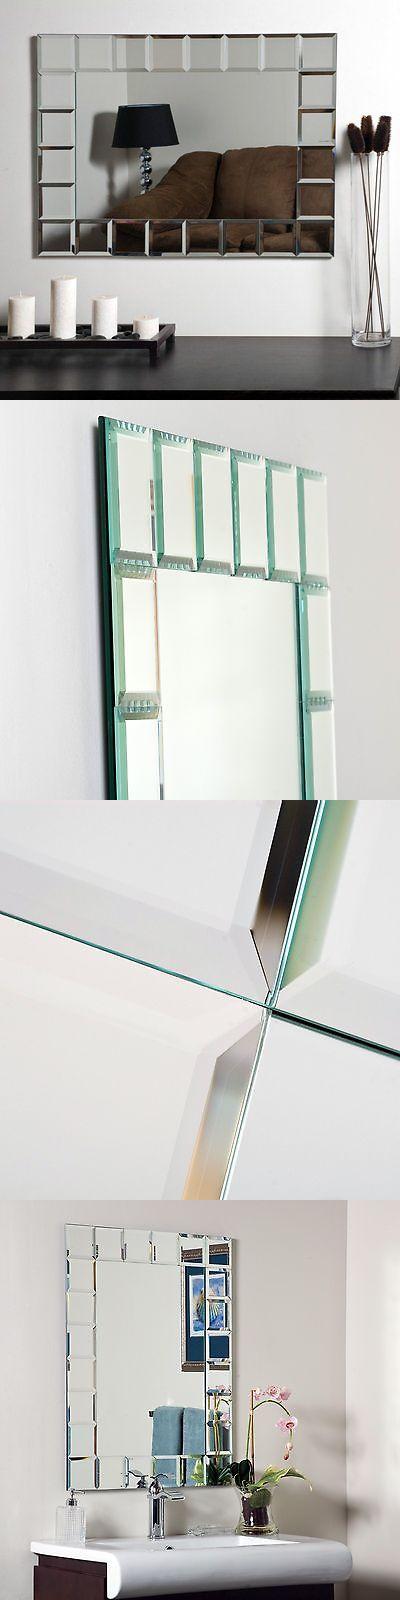 Mirrors 20580 Decor Wonderland Montreal Modern Frameless Bathroom Mirror